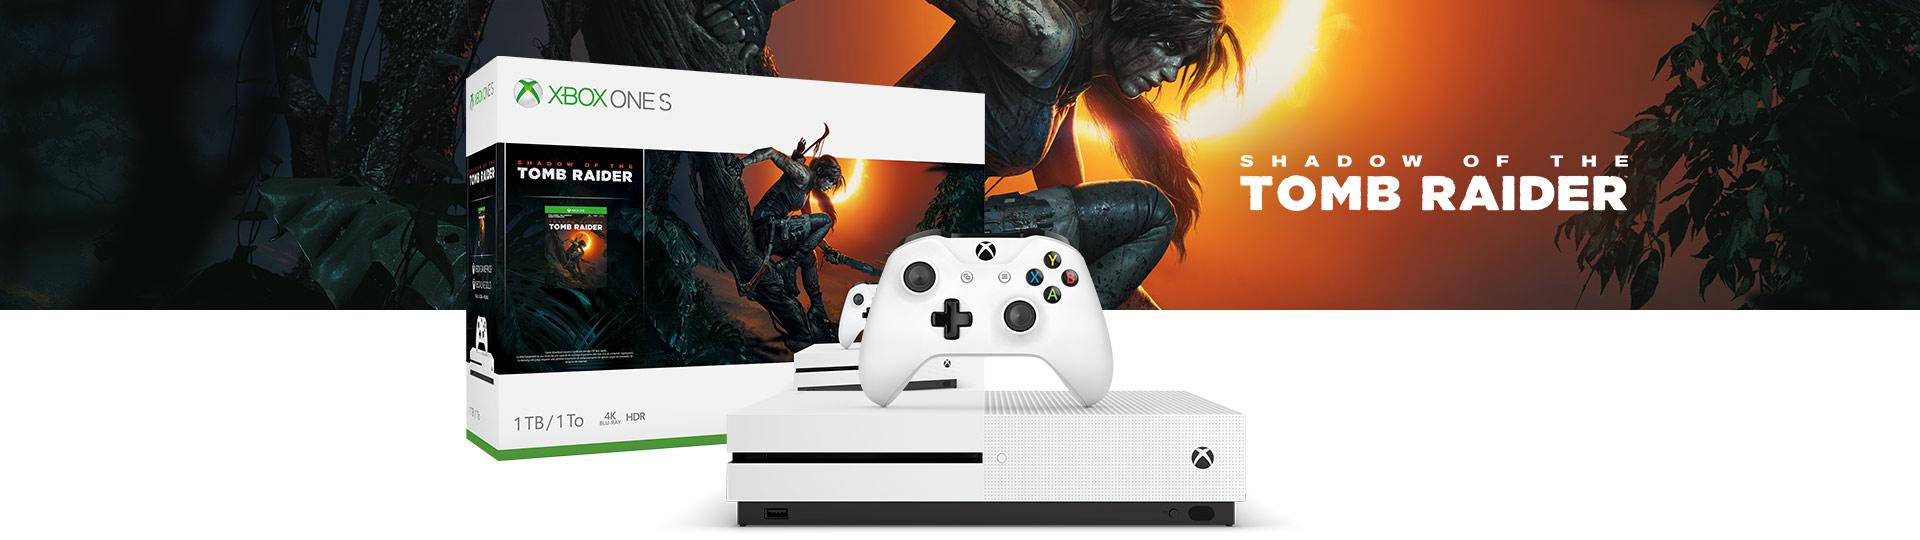 Xbox One X e Controle ao lado do Shadow of the Tomb Raider para Xbox One S de 1TB